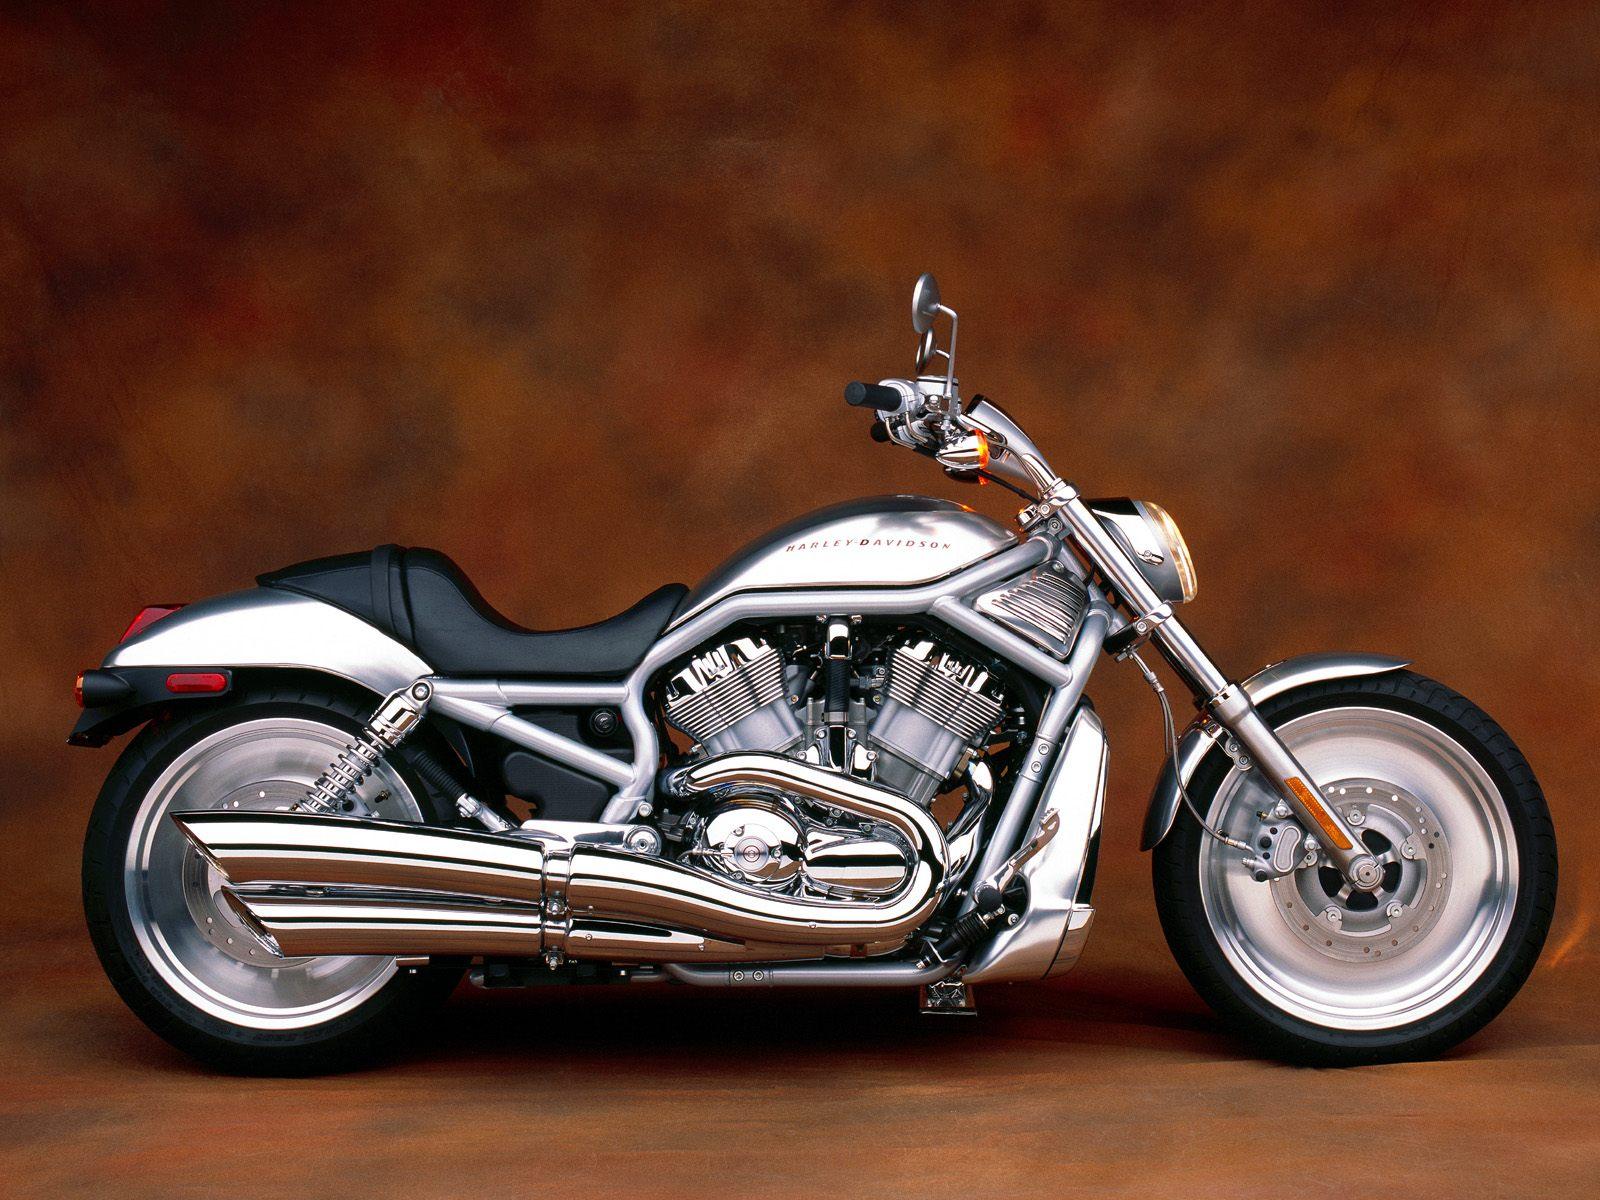 Harley Davidson V Rod HD dekstop wallpapers   2002 Harley Davidson 1600x1200